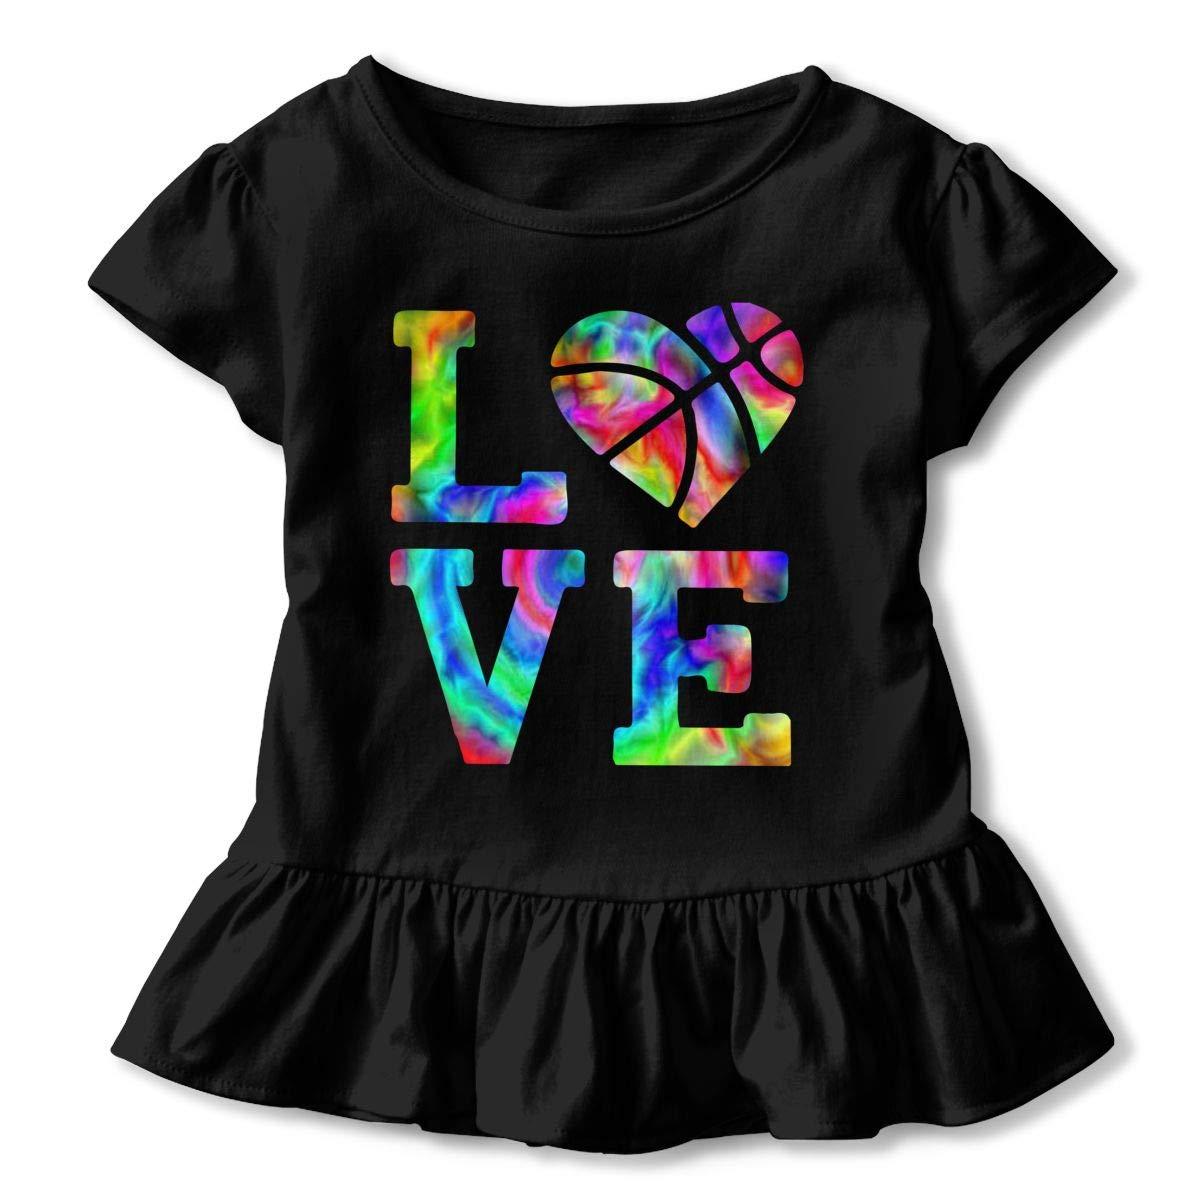 CZnuen Tie Dye Basketball Love 2-6T Baby Girls Cotton Jersey Short Sleeve Ruffle Tee